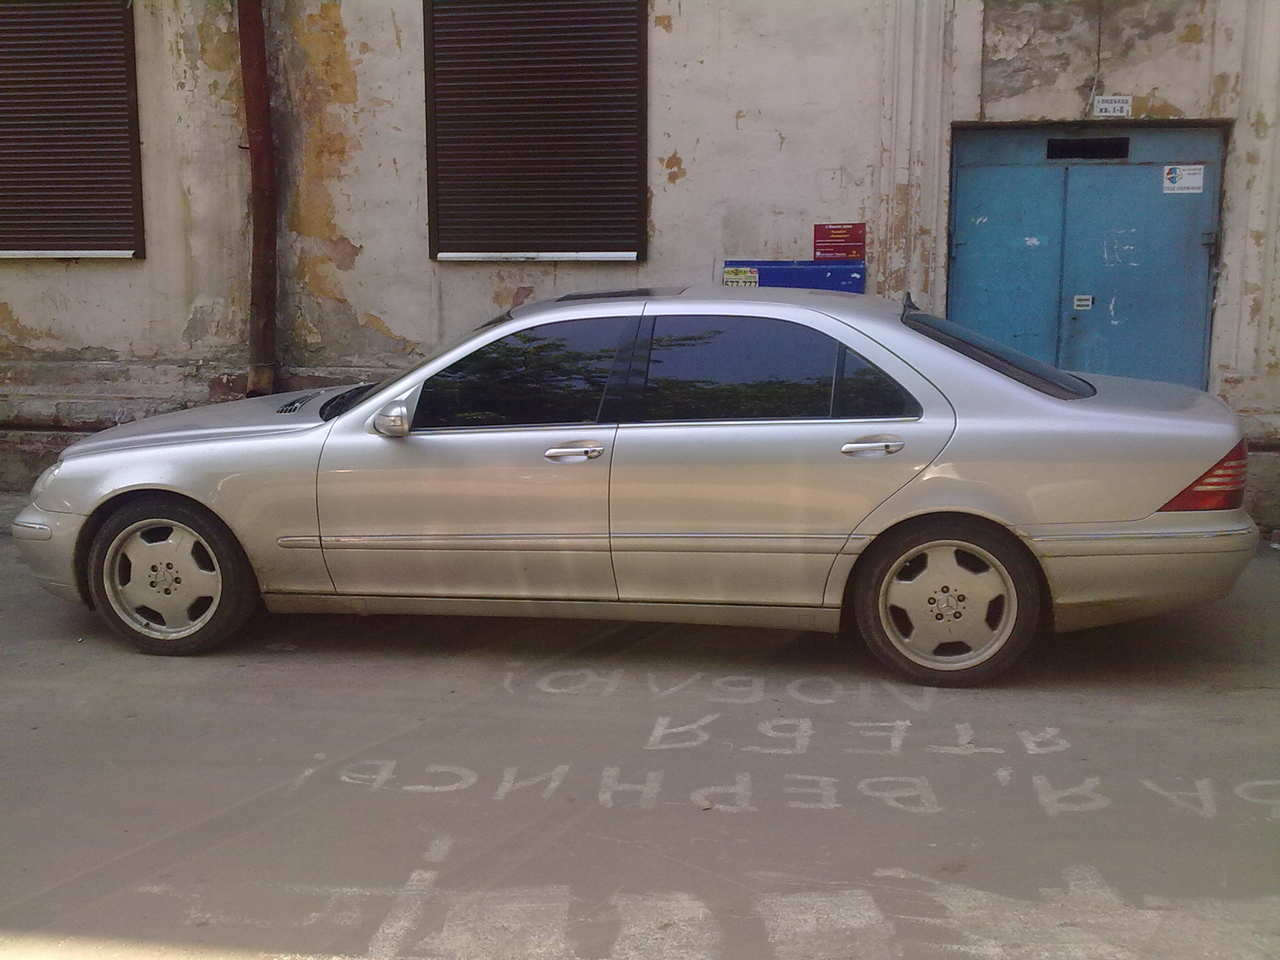 Used 2002 mercedes benz s class photos 3700cc gasoline for Mercedes benz s class 2002